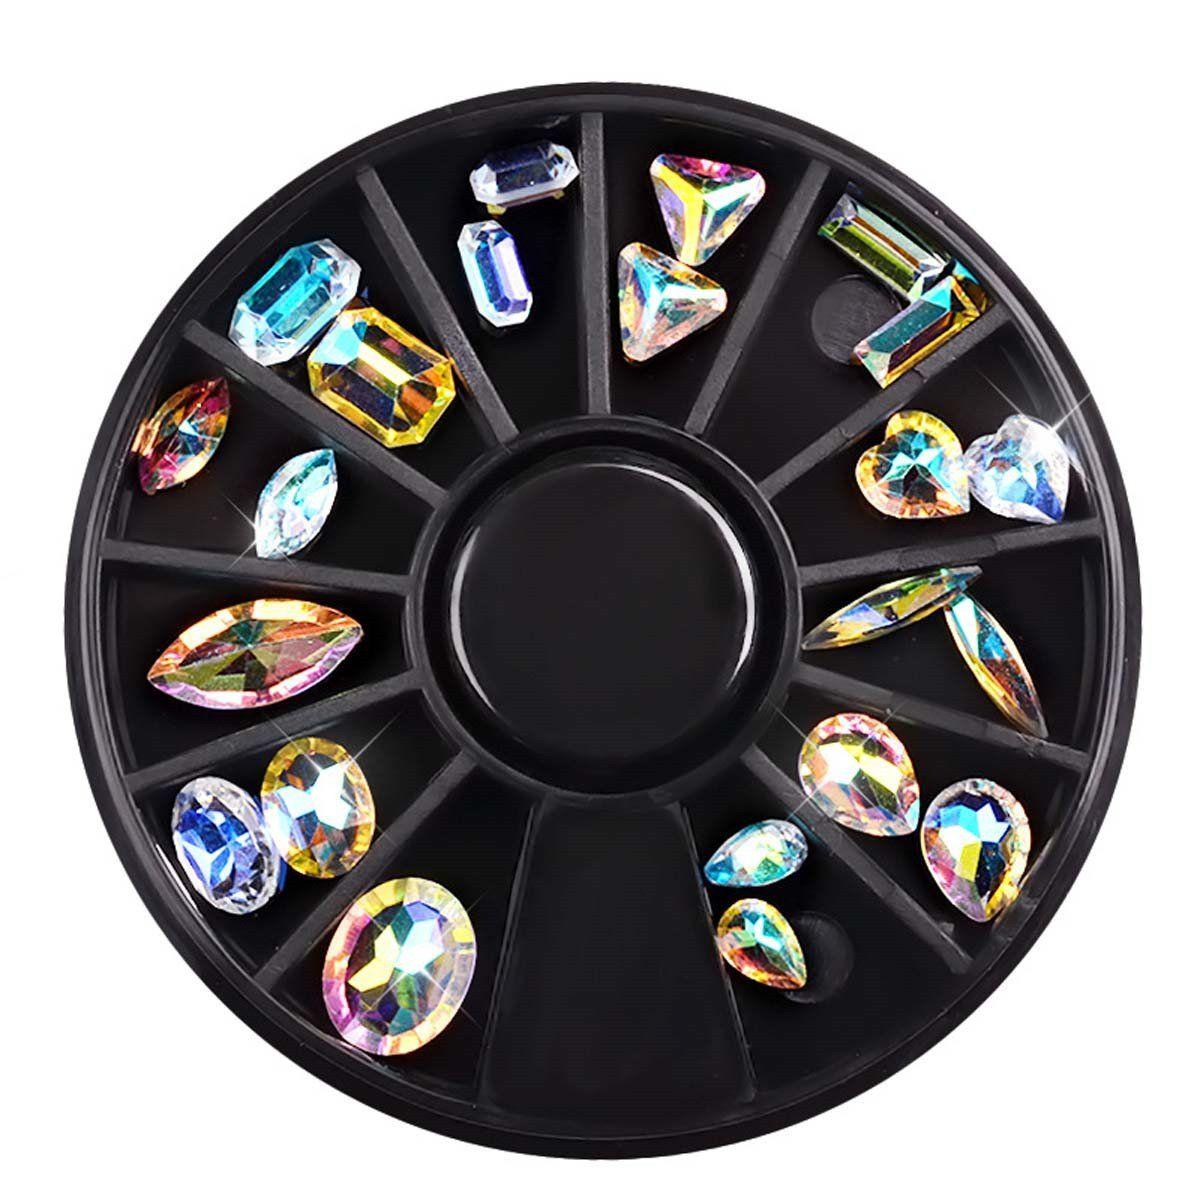 Diy Nail Ideas Doc Martens Nail Art And More Of Our: Mezerdoo 5 Wheels Mixed Glitter Colorful Nail Art Tip Nail